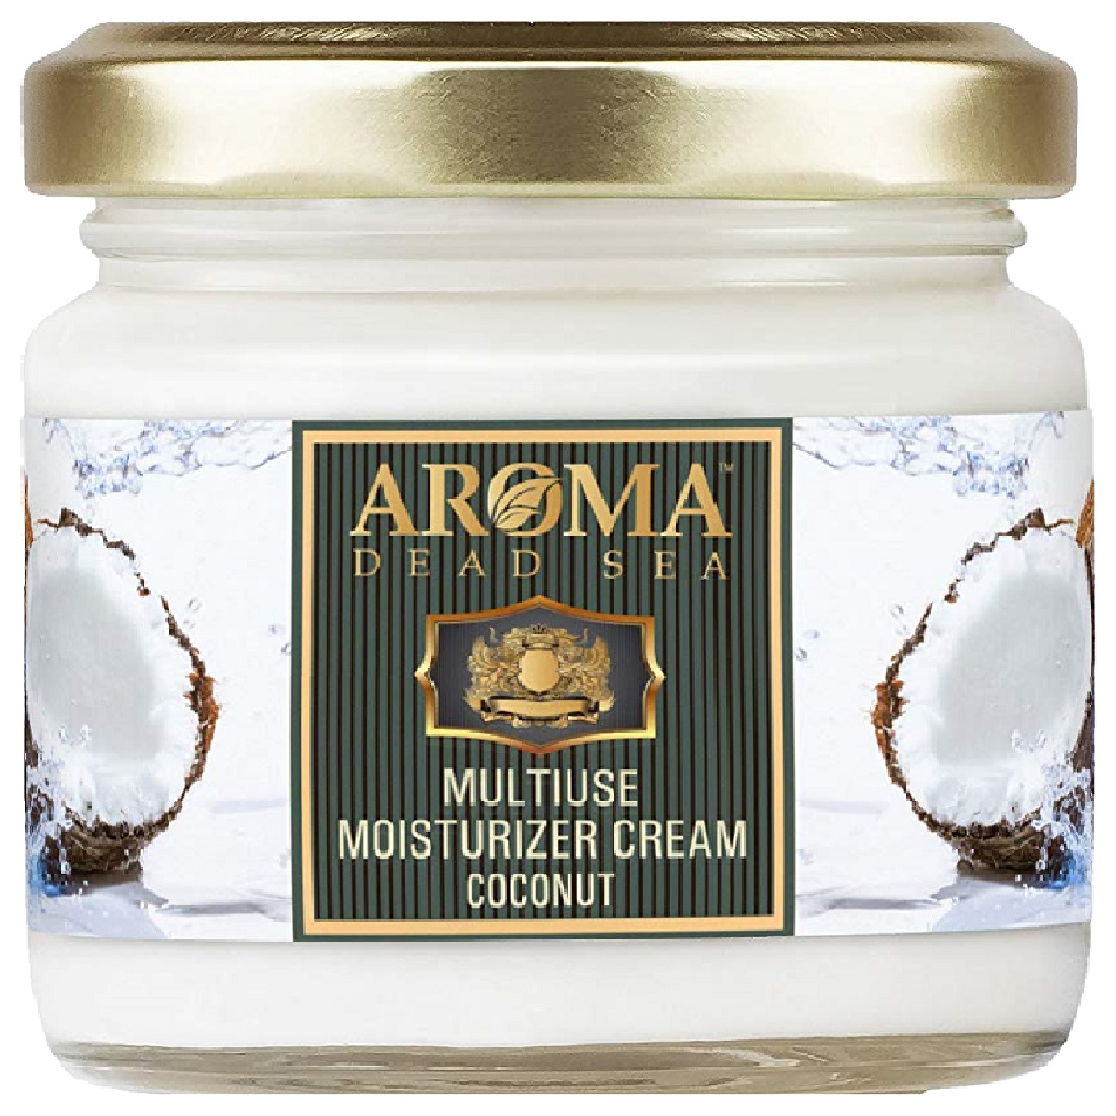 Крем для тела Aroma Dead Sea Multiuse Moisturizer Cream Coconut 110 мл